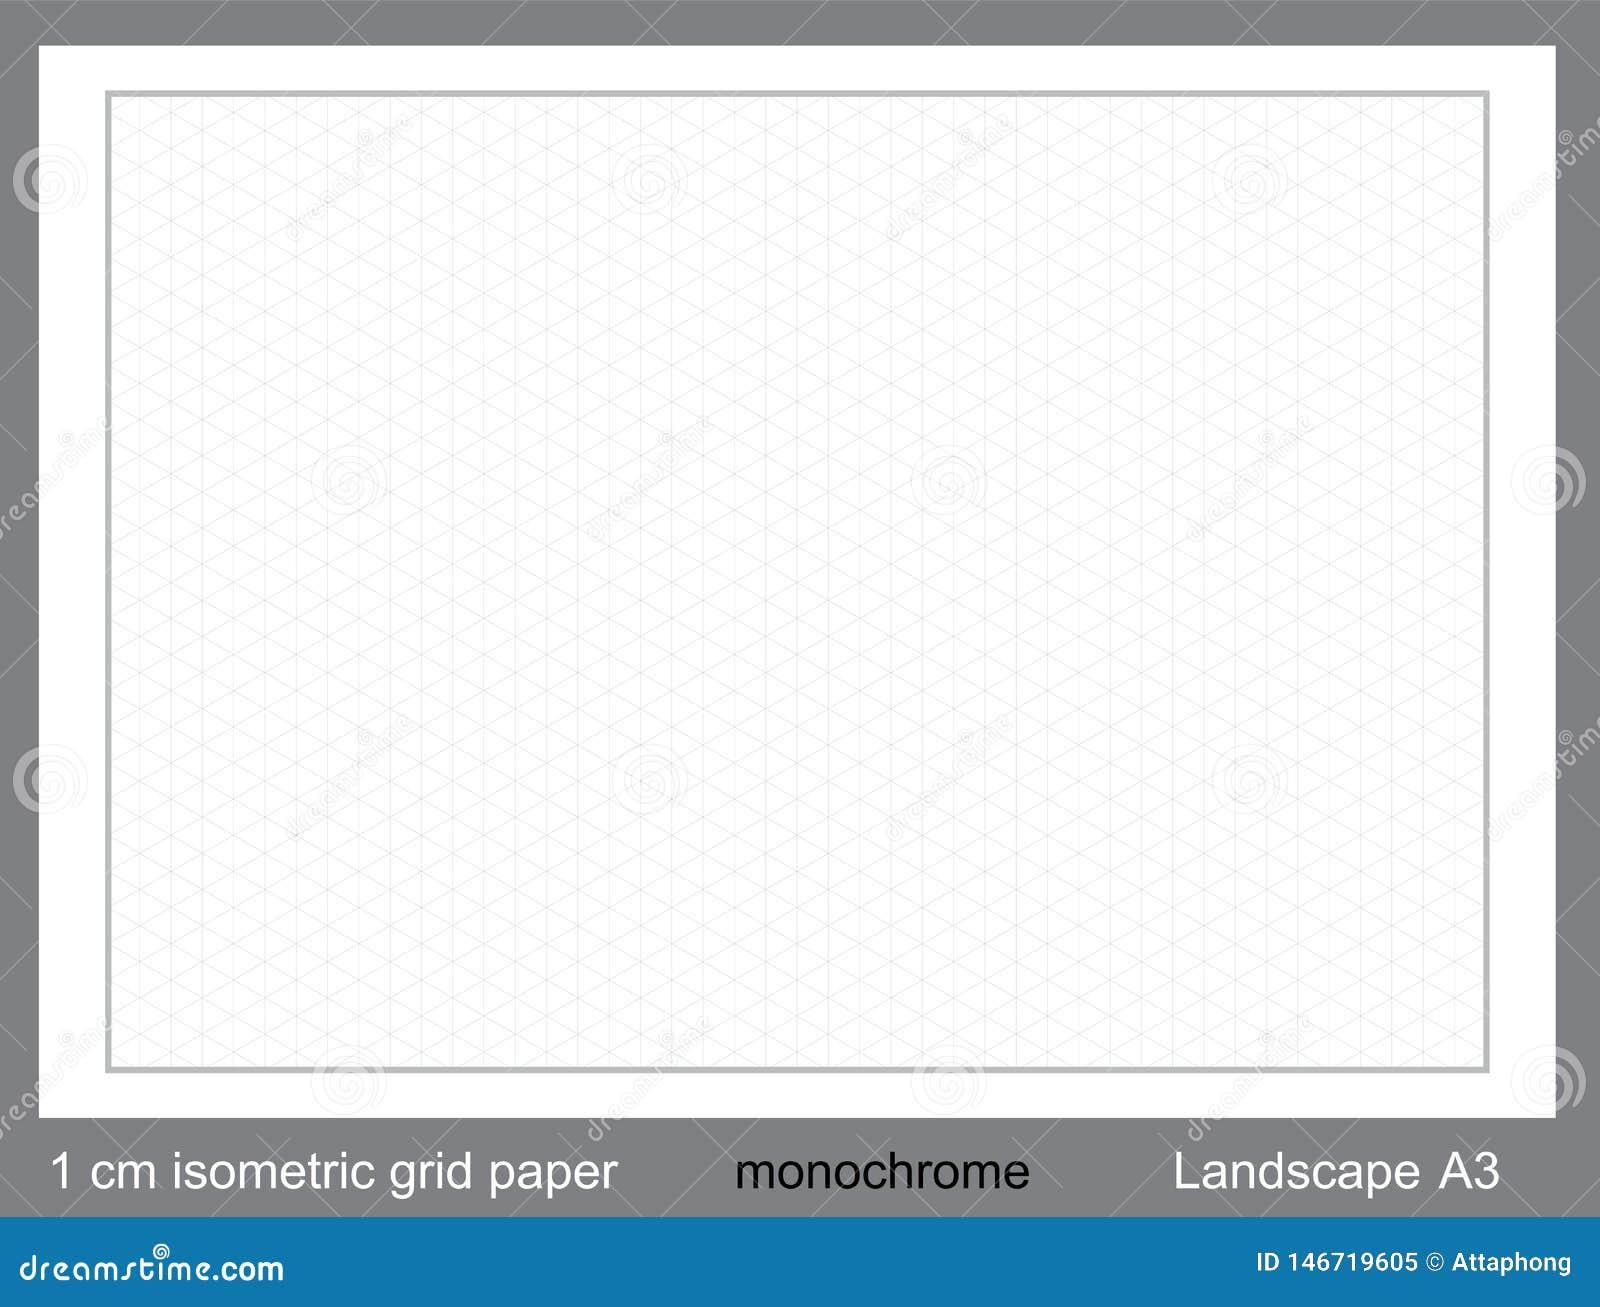 1 cm a3 isometric grid paper isometric grid vector